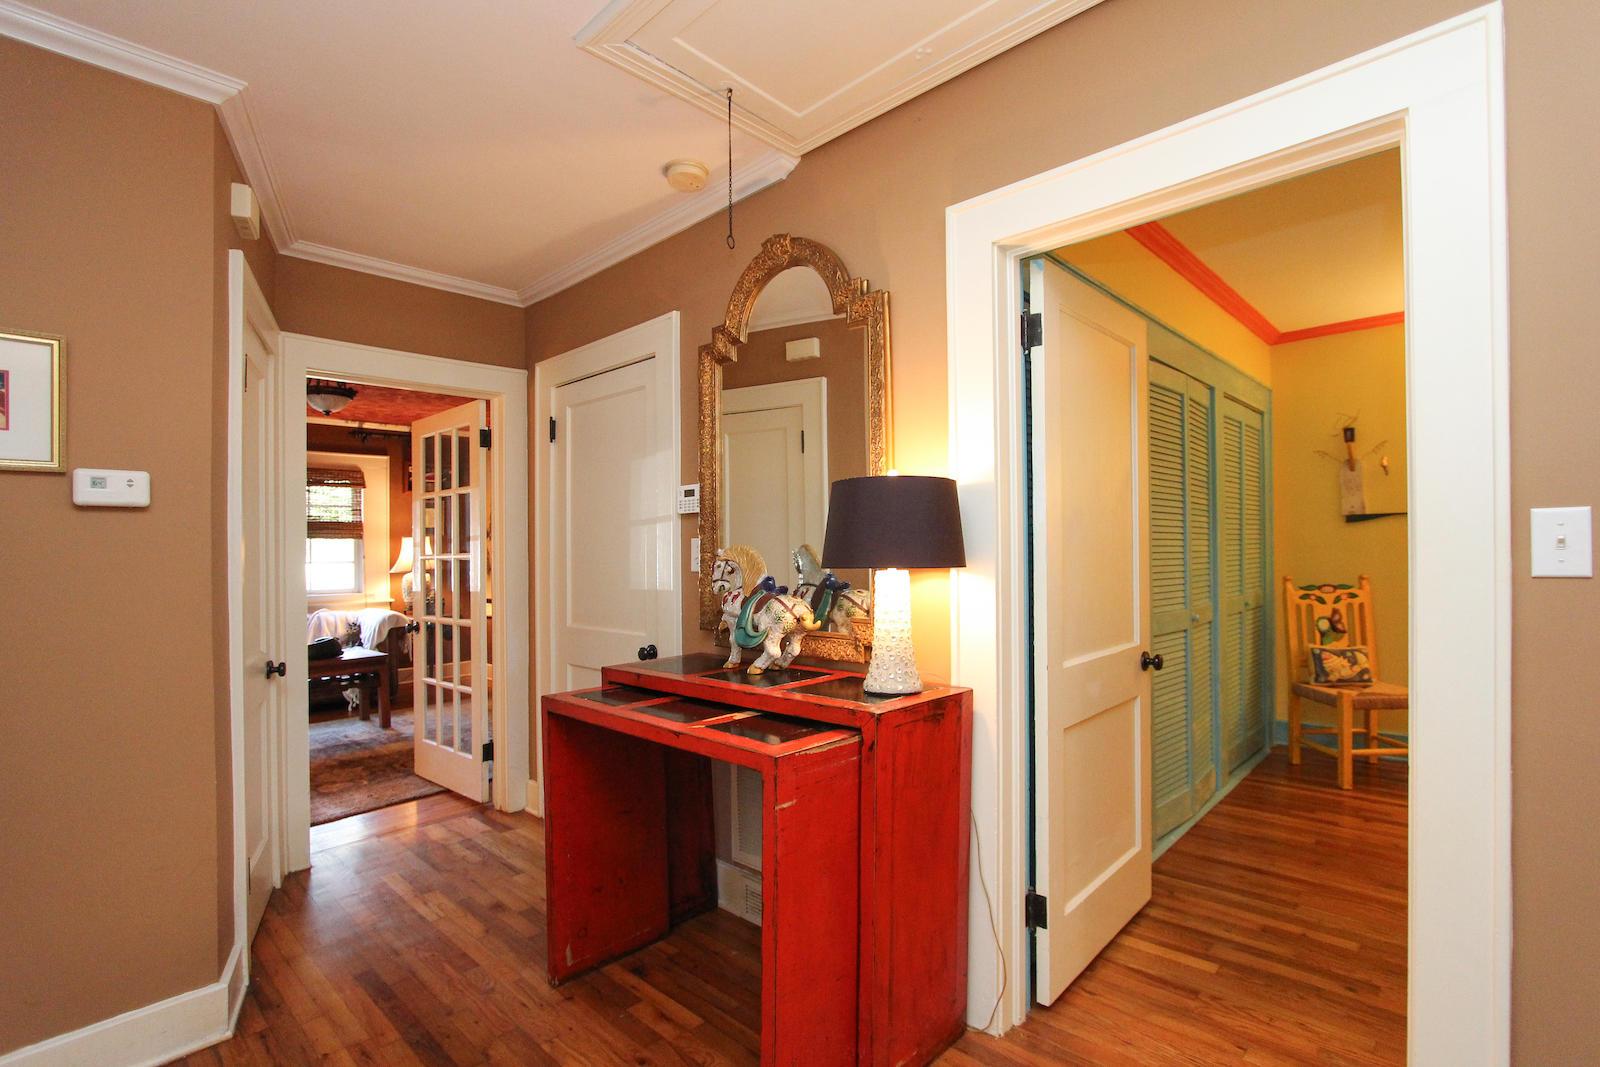 Albemarle Point Homes For Sale - 3 Albemarle, Charleston, SC - 16